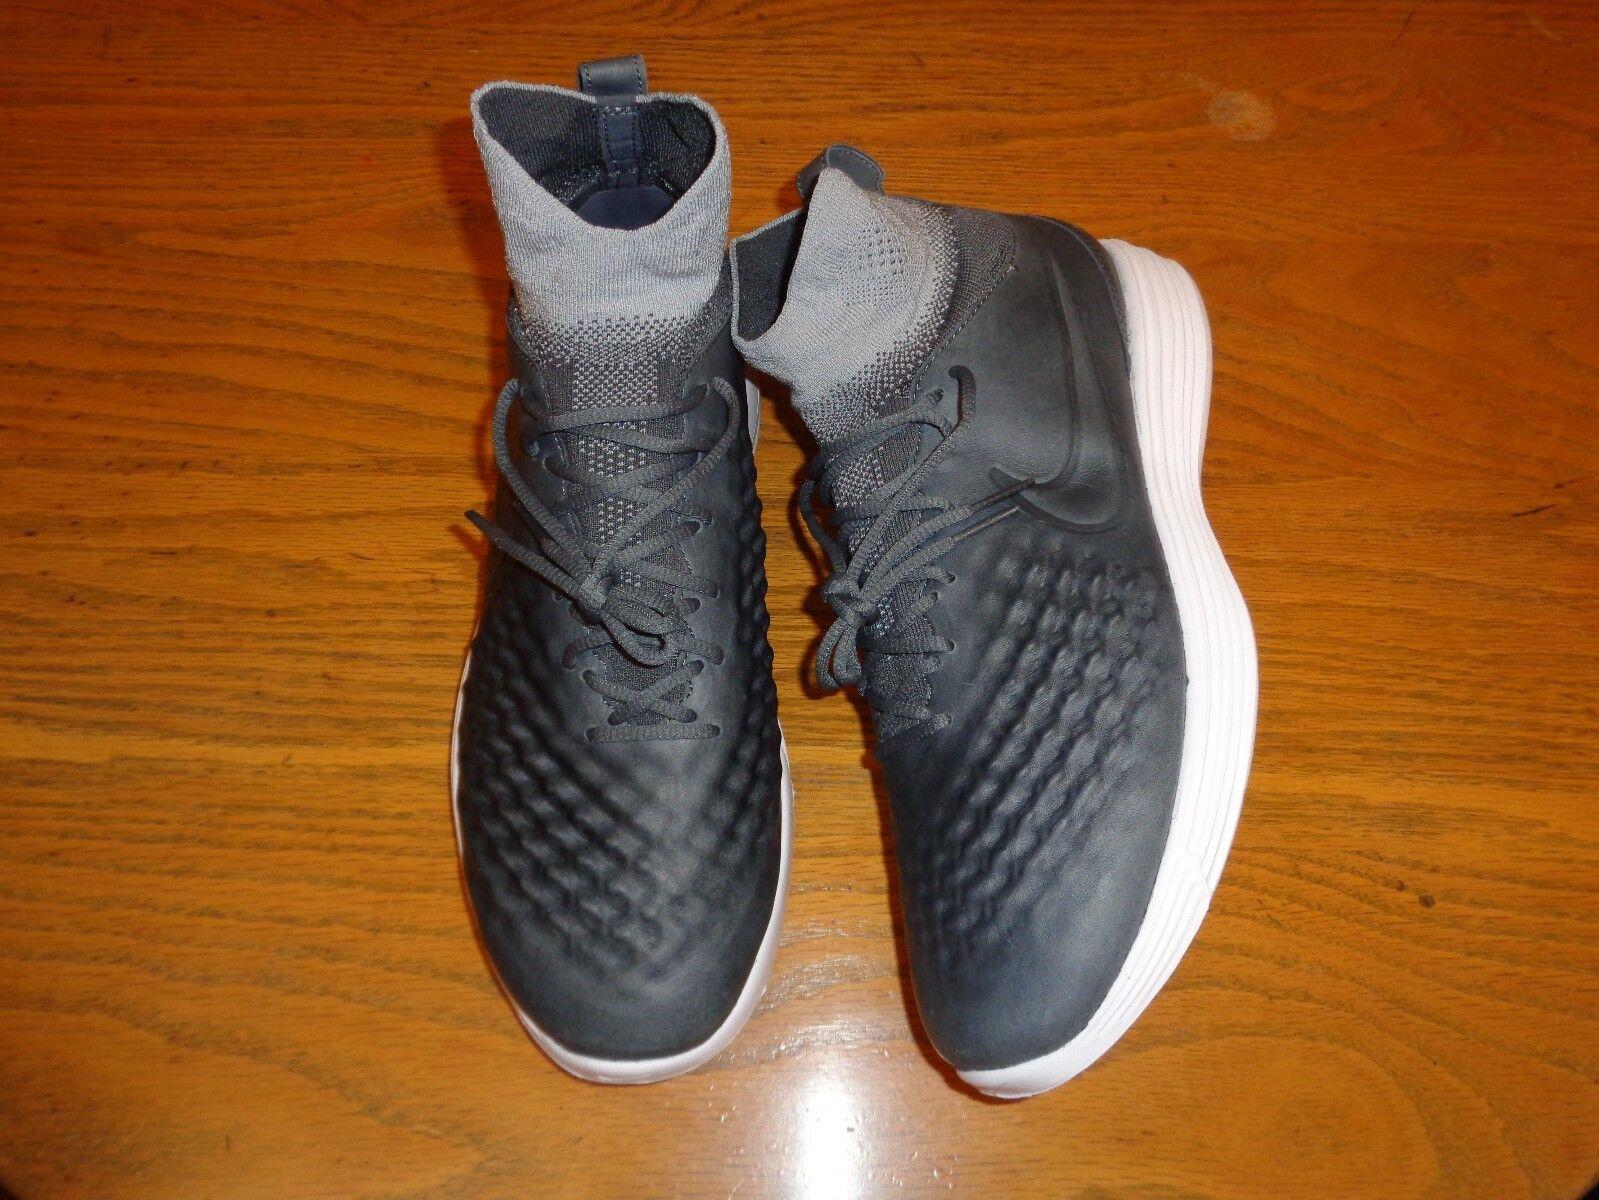 Nike lunar magista ii flyknit Uomo scarpe da ginnastica 852614-002 nuove dimensioni 9